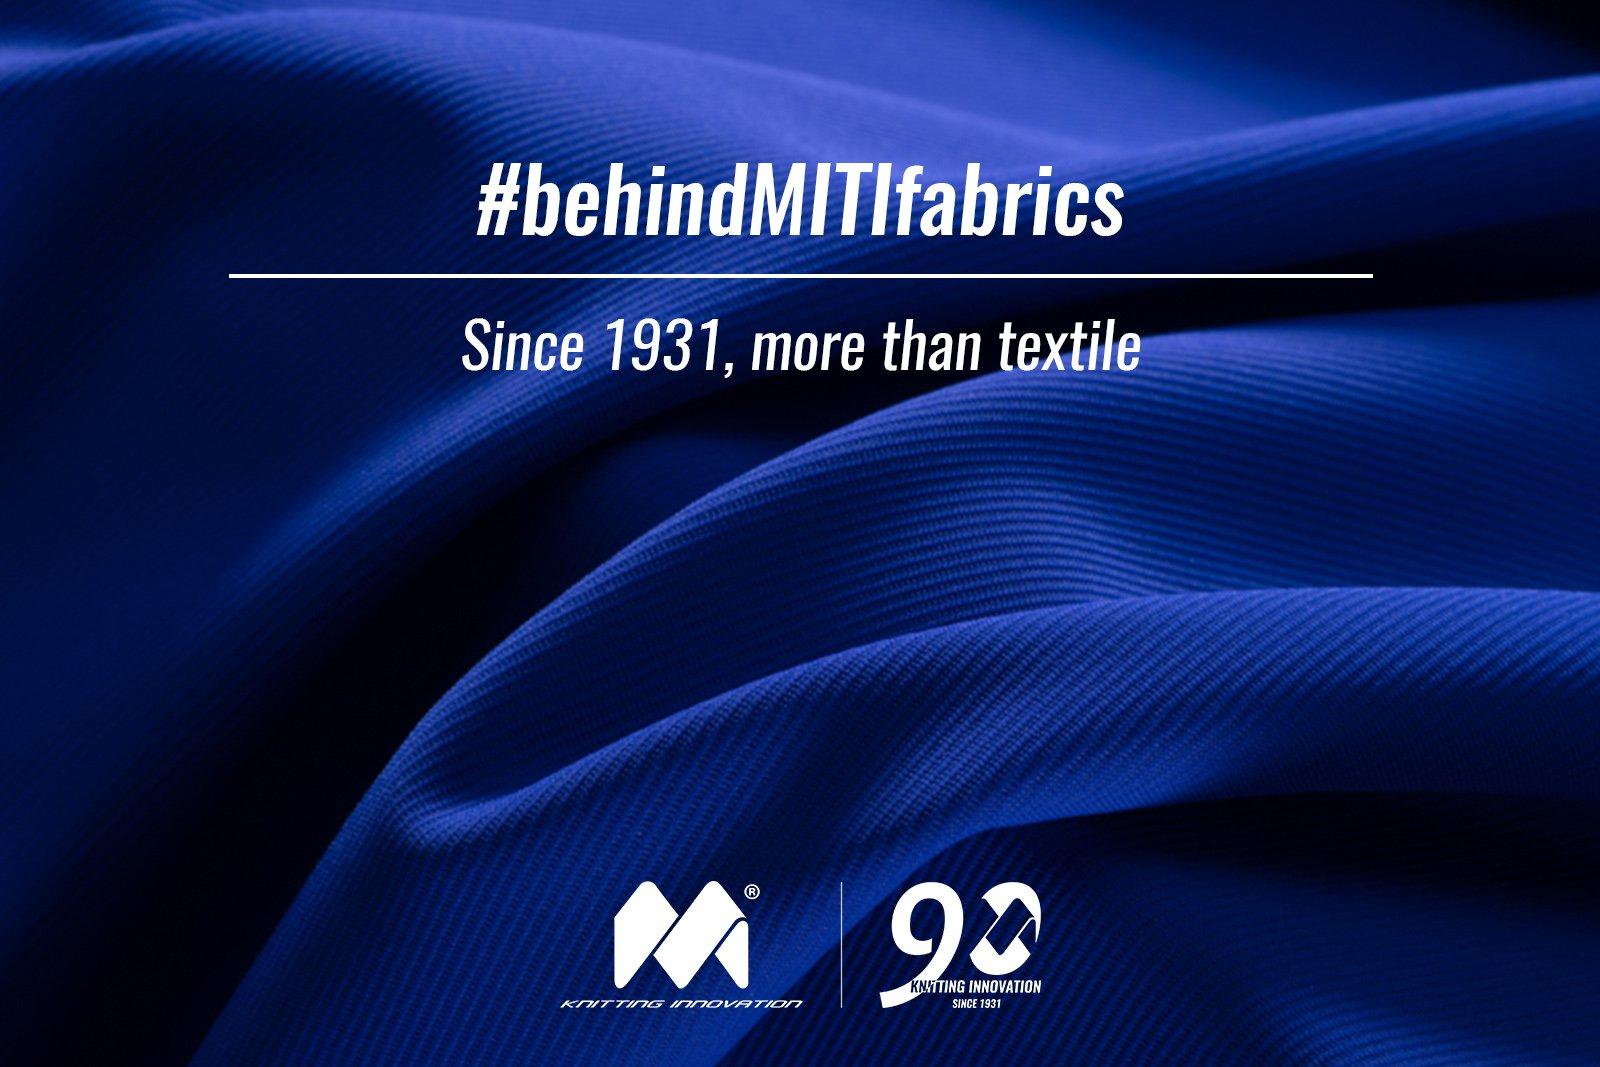 #behindMITIfabrics